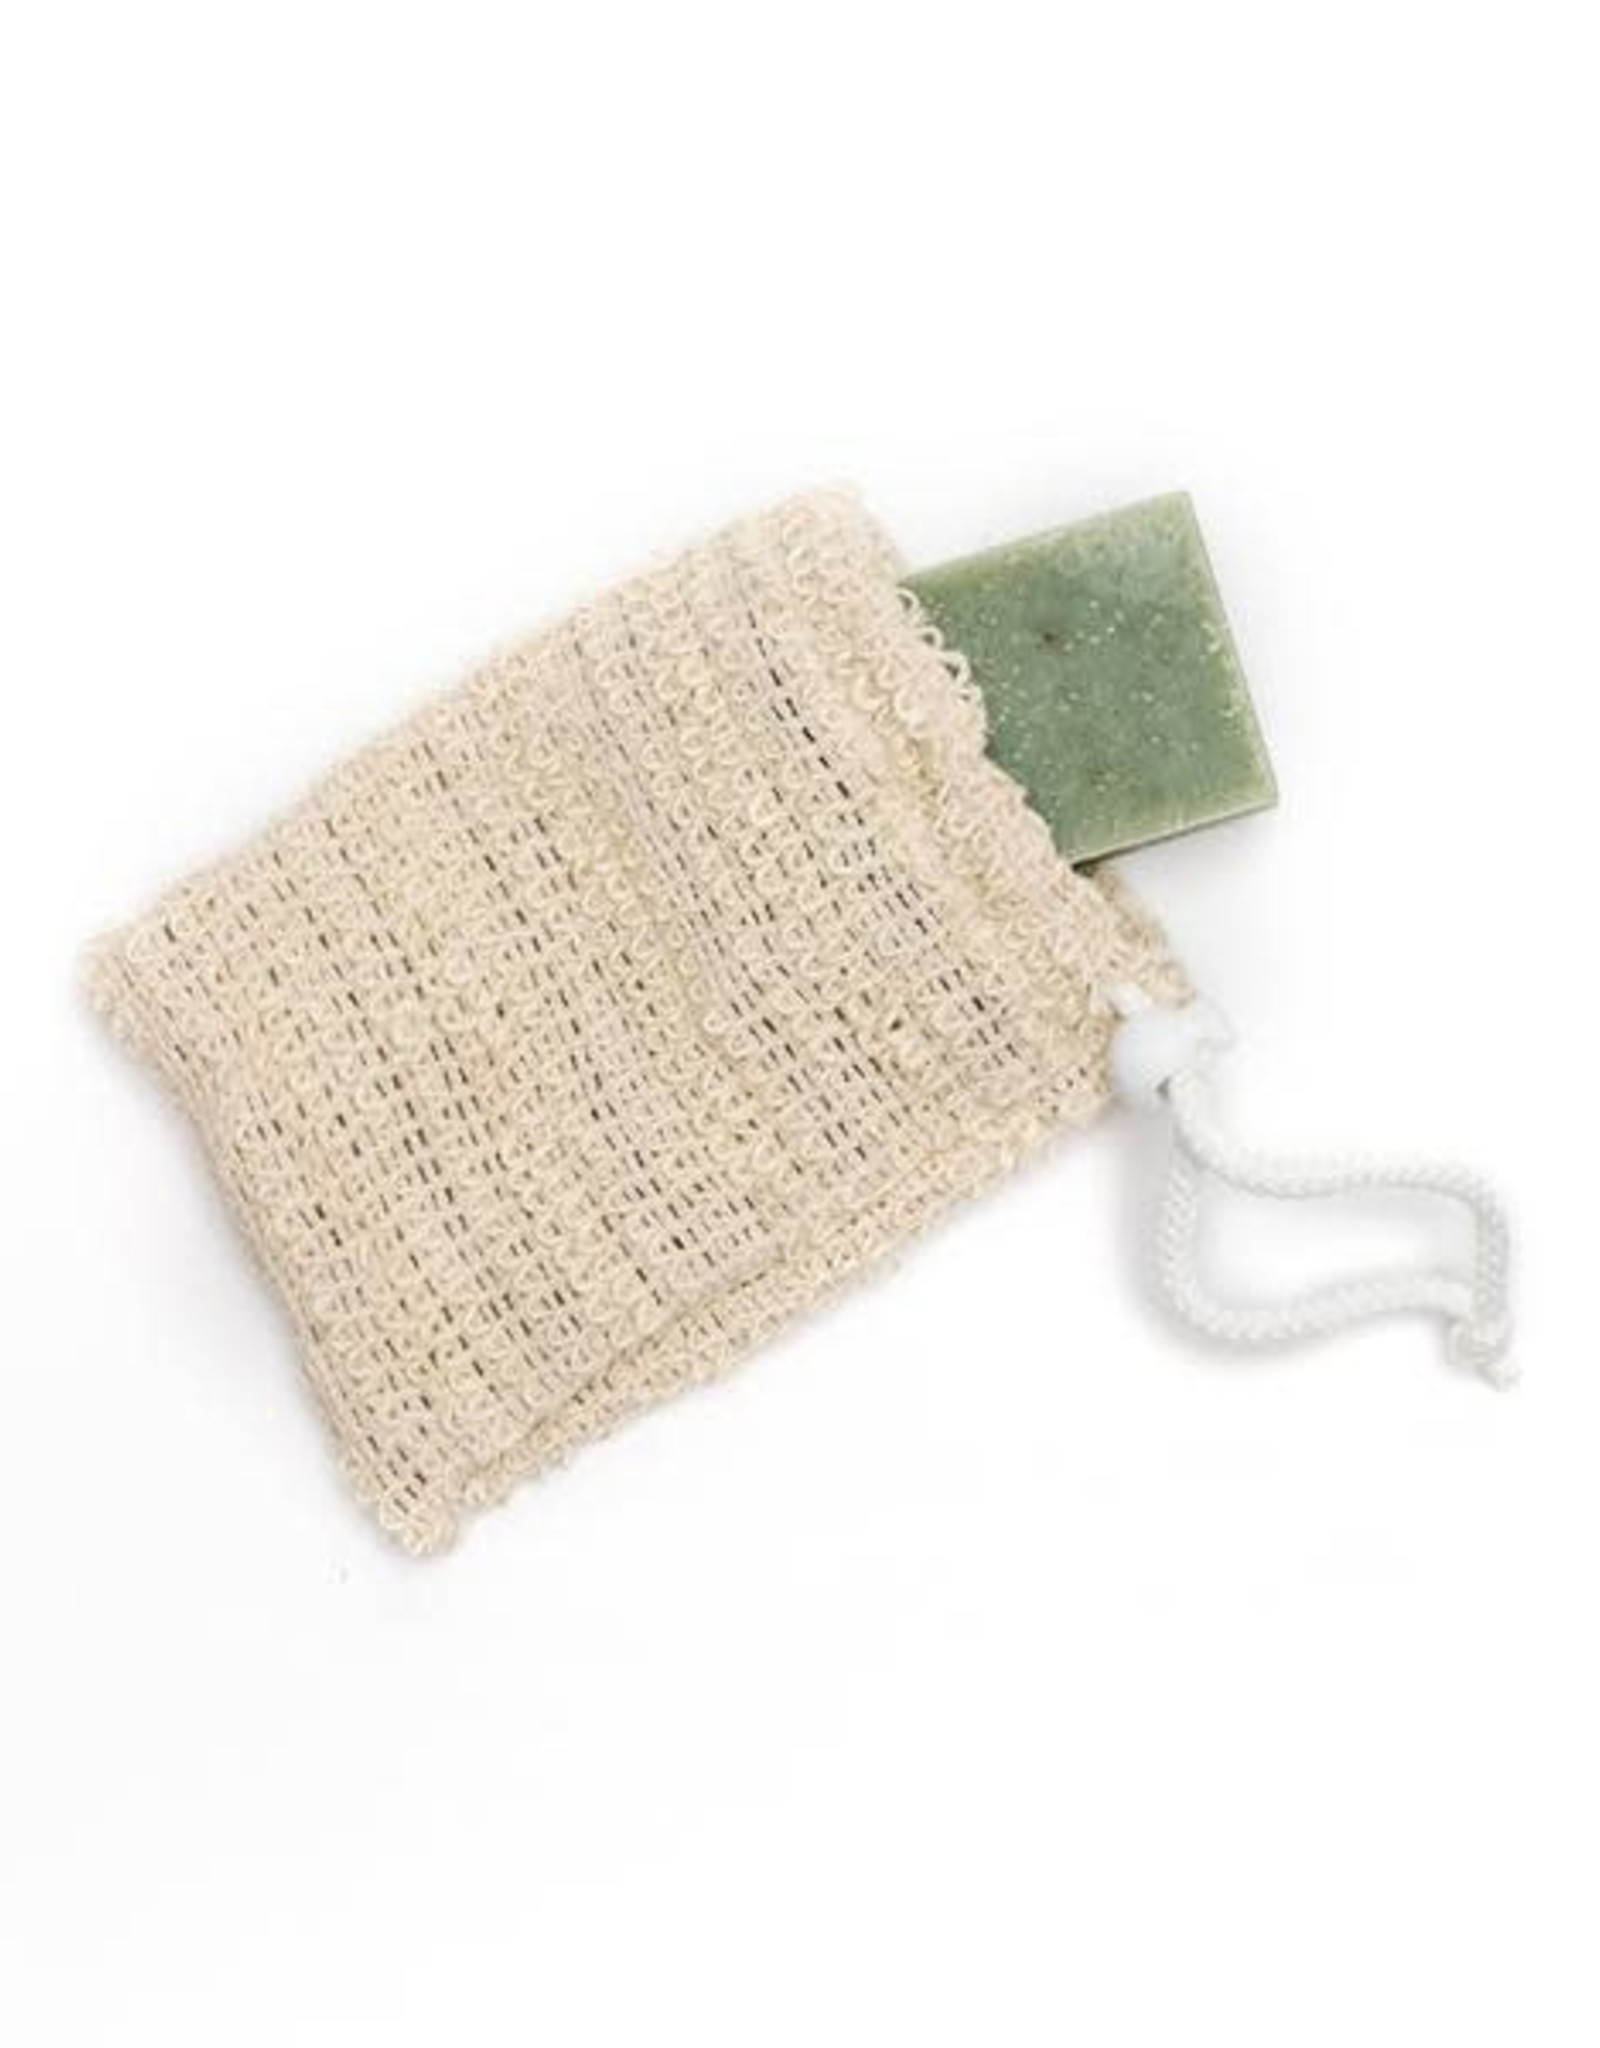 Cait & Co Sisal Soap Sack